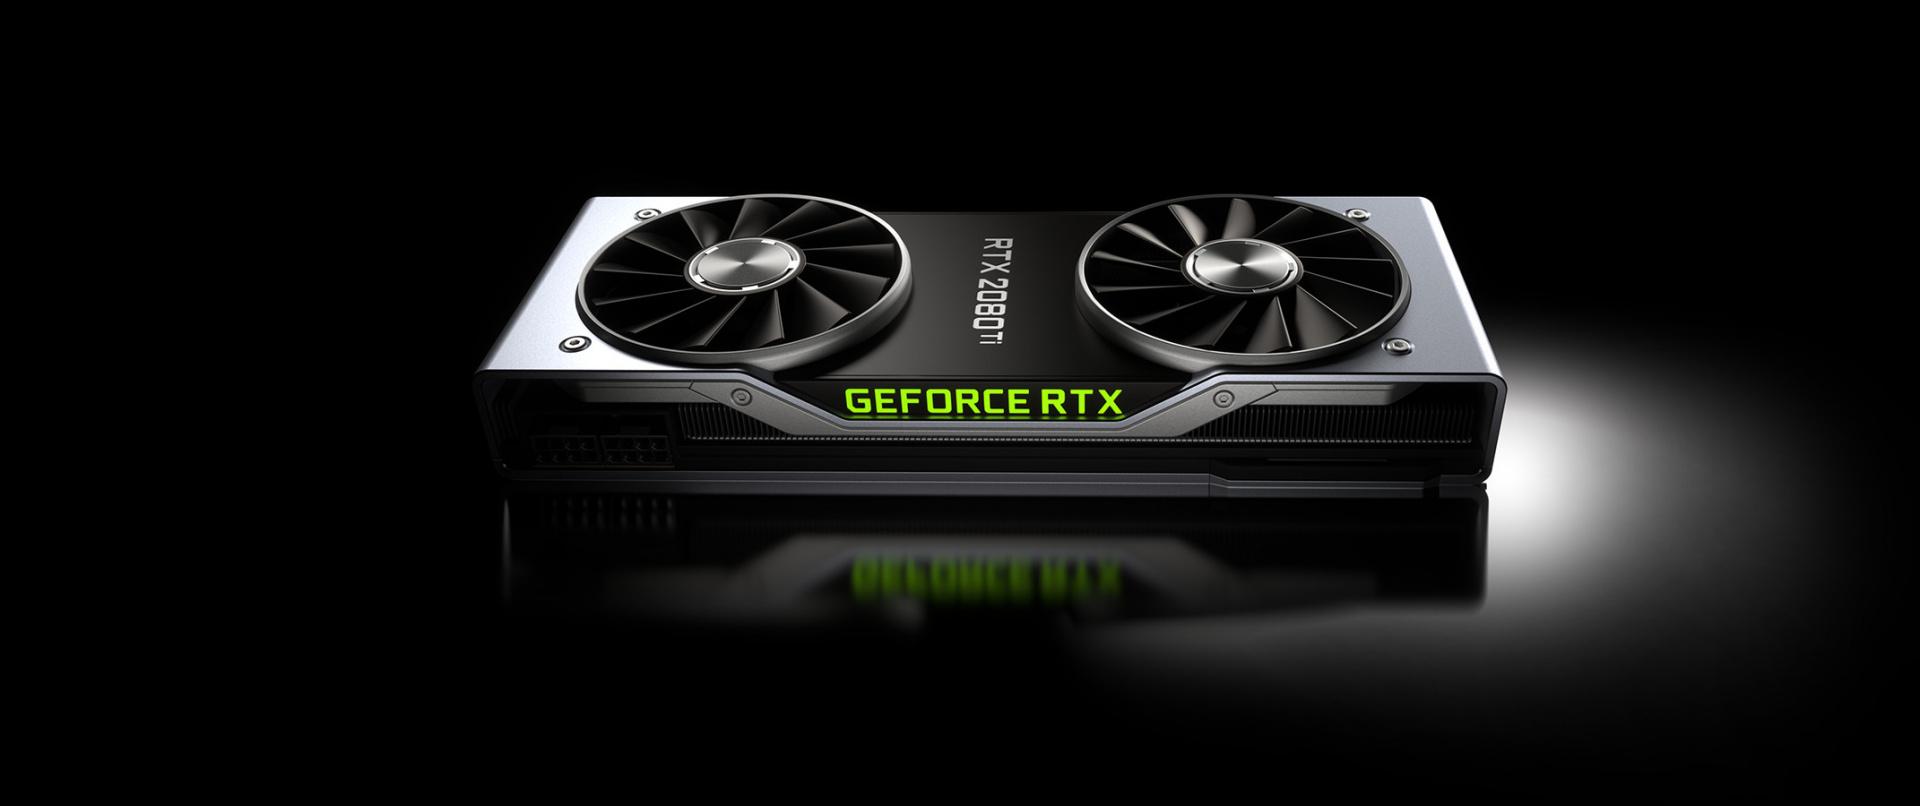 СМИ: NVIDIA прекращает производство карт серии RTX 20хх